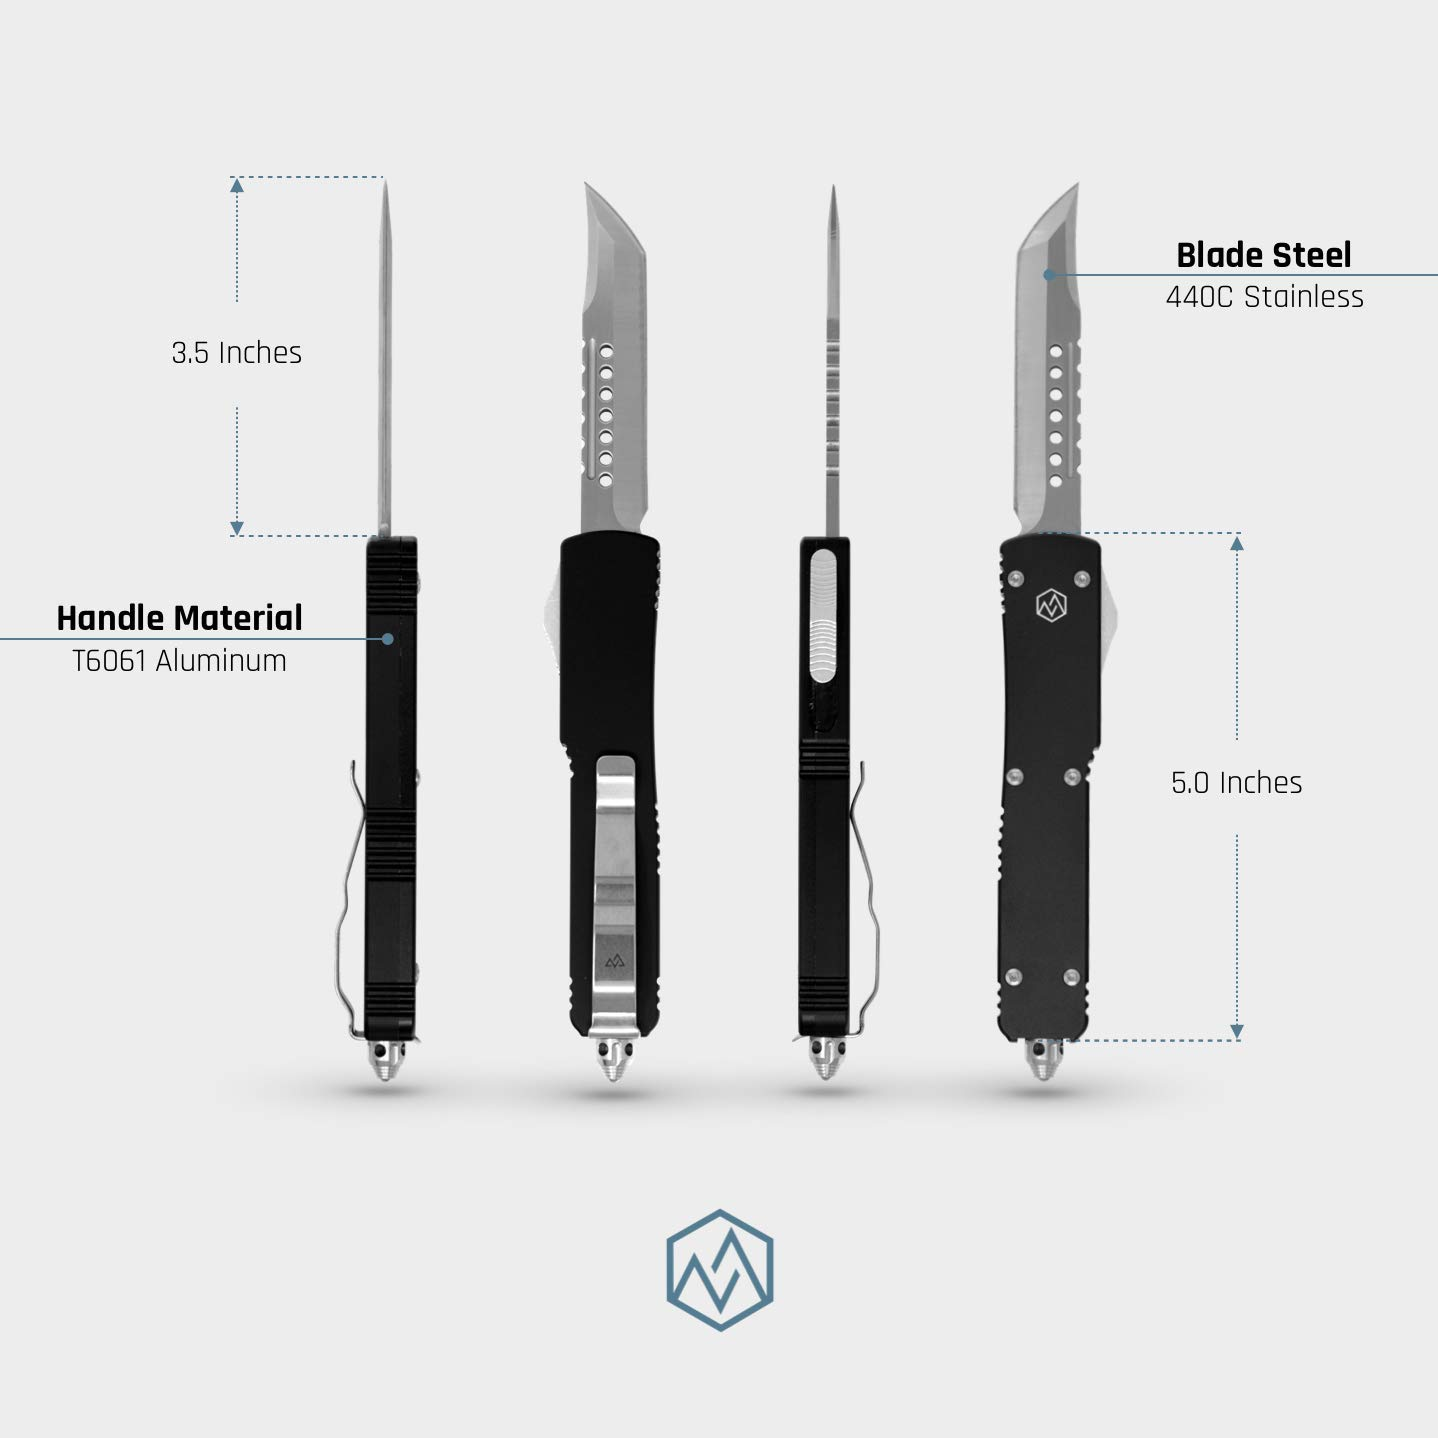 OTF Double Action Safety Knife (Matte Black & Satin Tanto Blade) by OTF (Image #3)